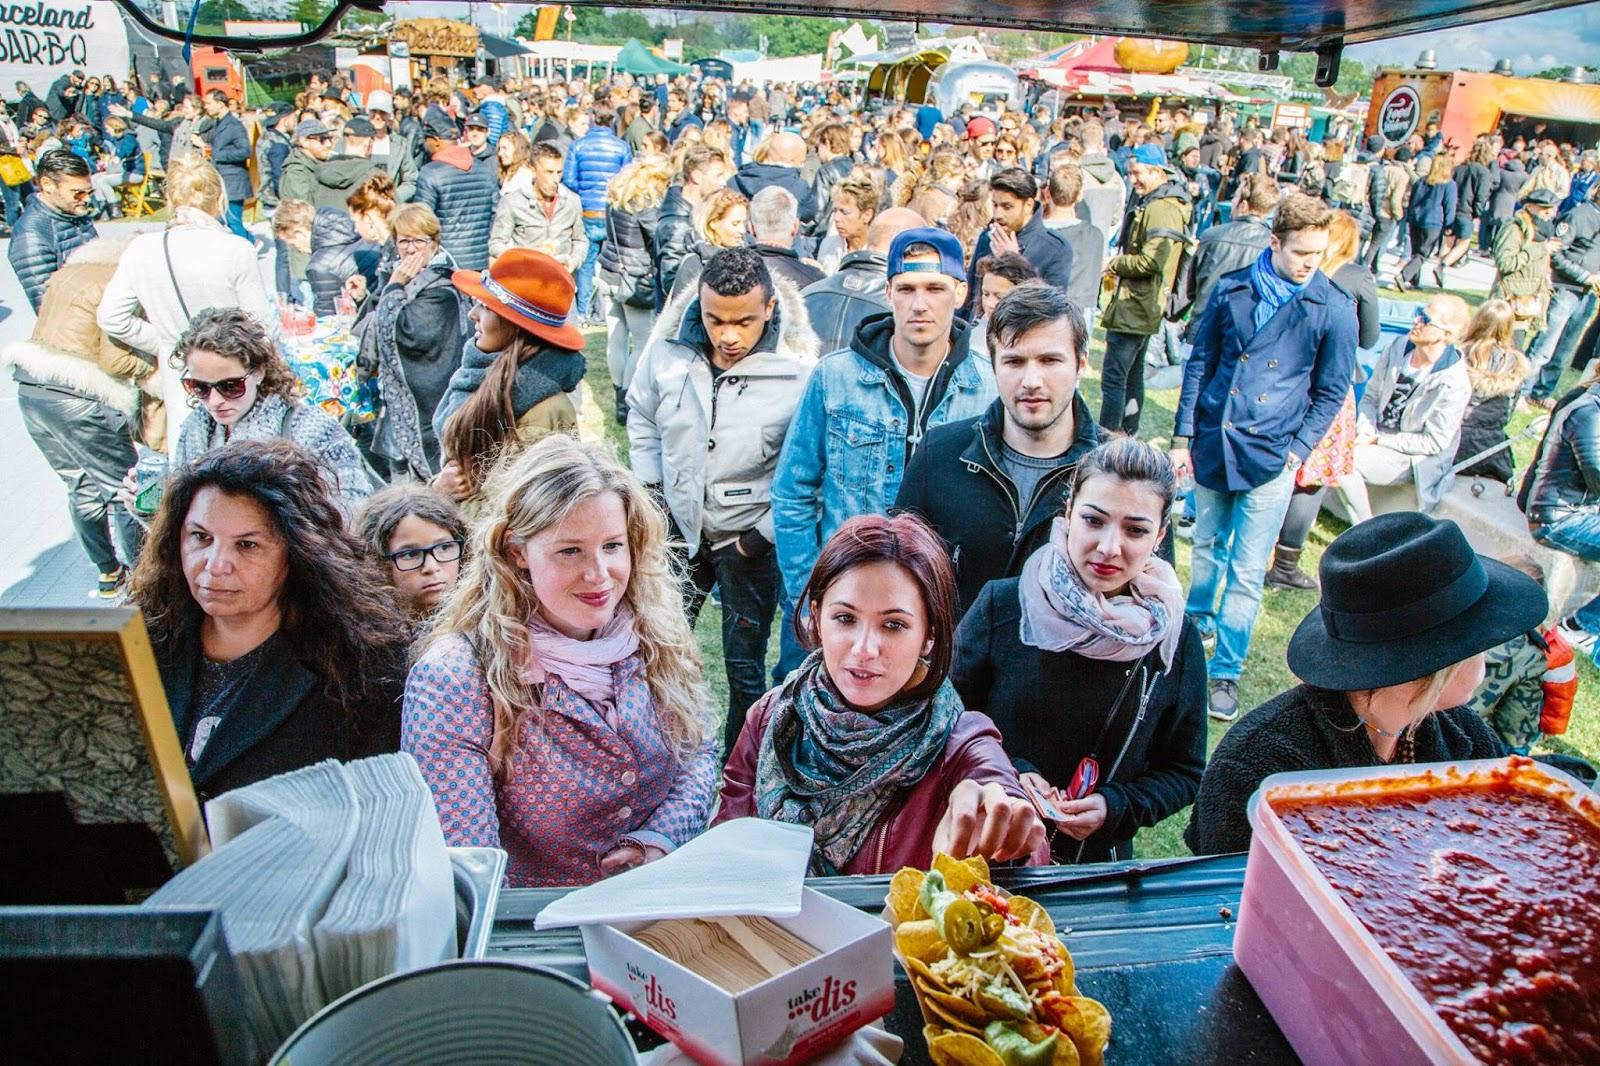 Rollende Keukens Amsterdam : When in amsterdam amsterdam food festival on wheels